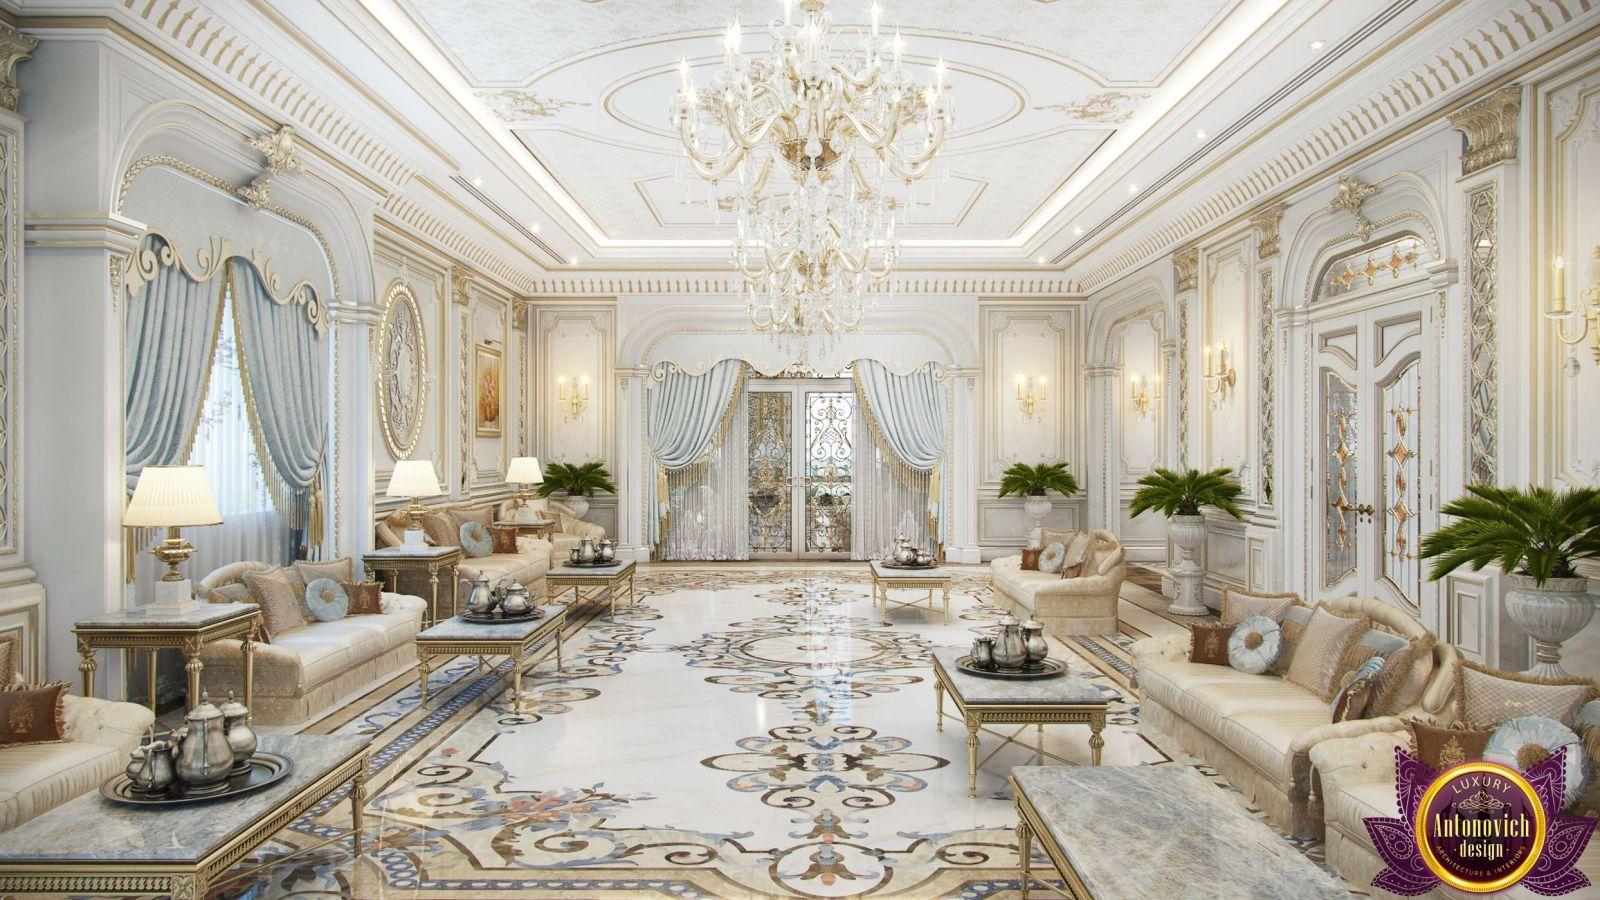 Luxury Antonovich Exclusive Interior Design in Saudi Arabia.